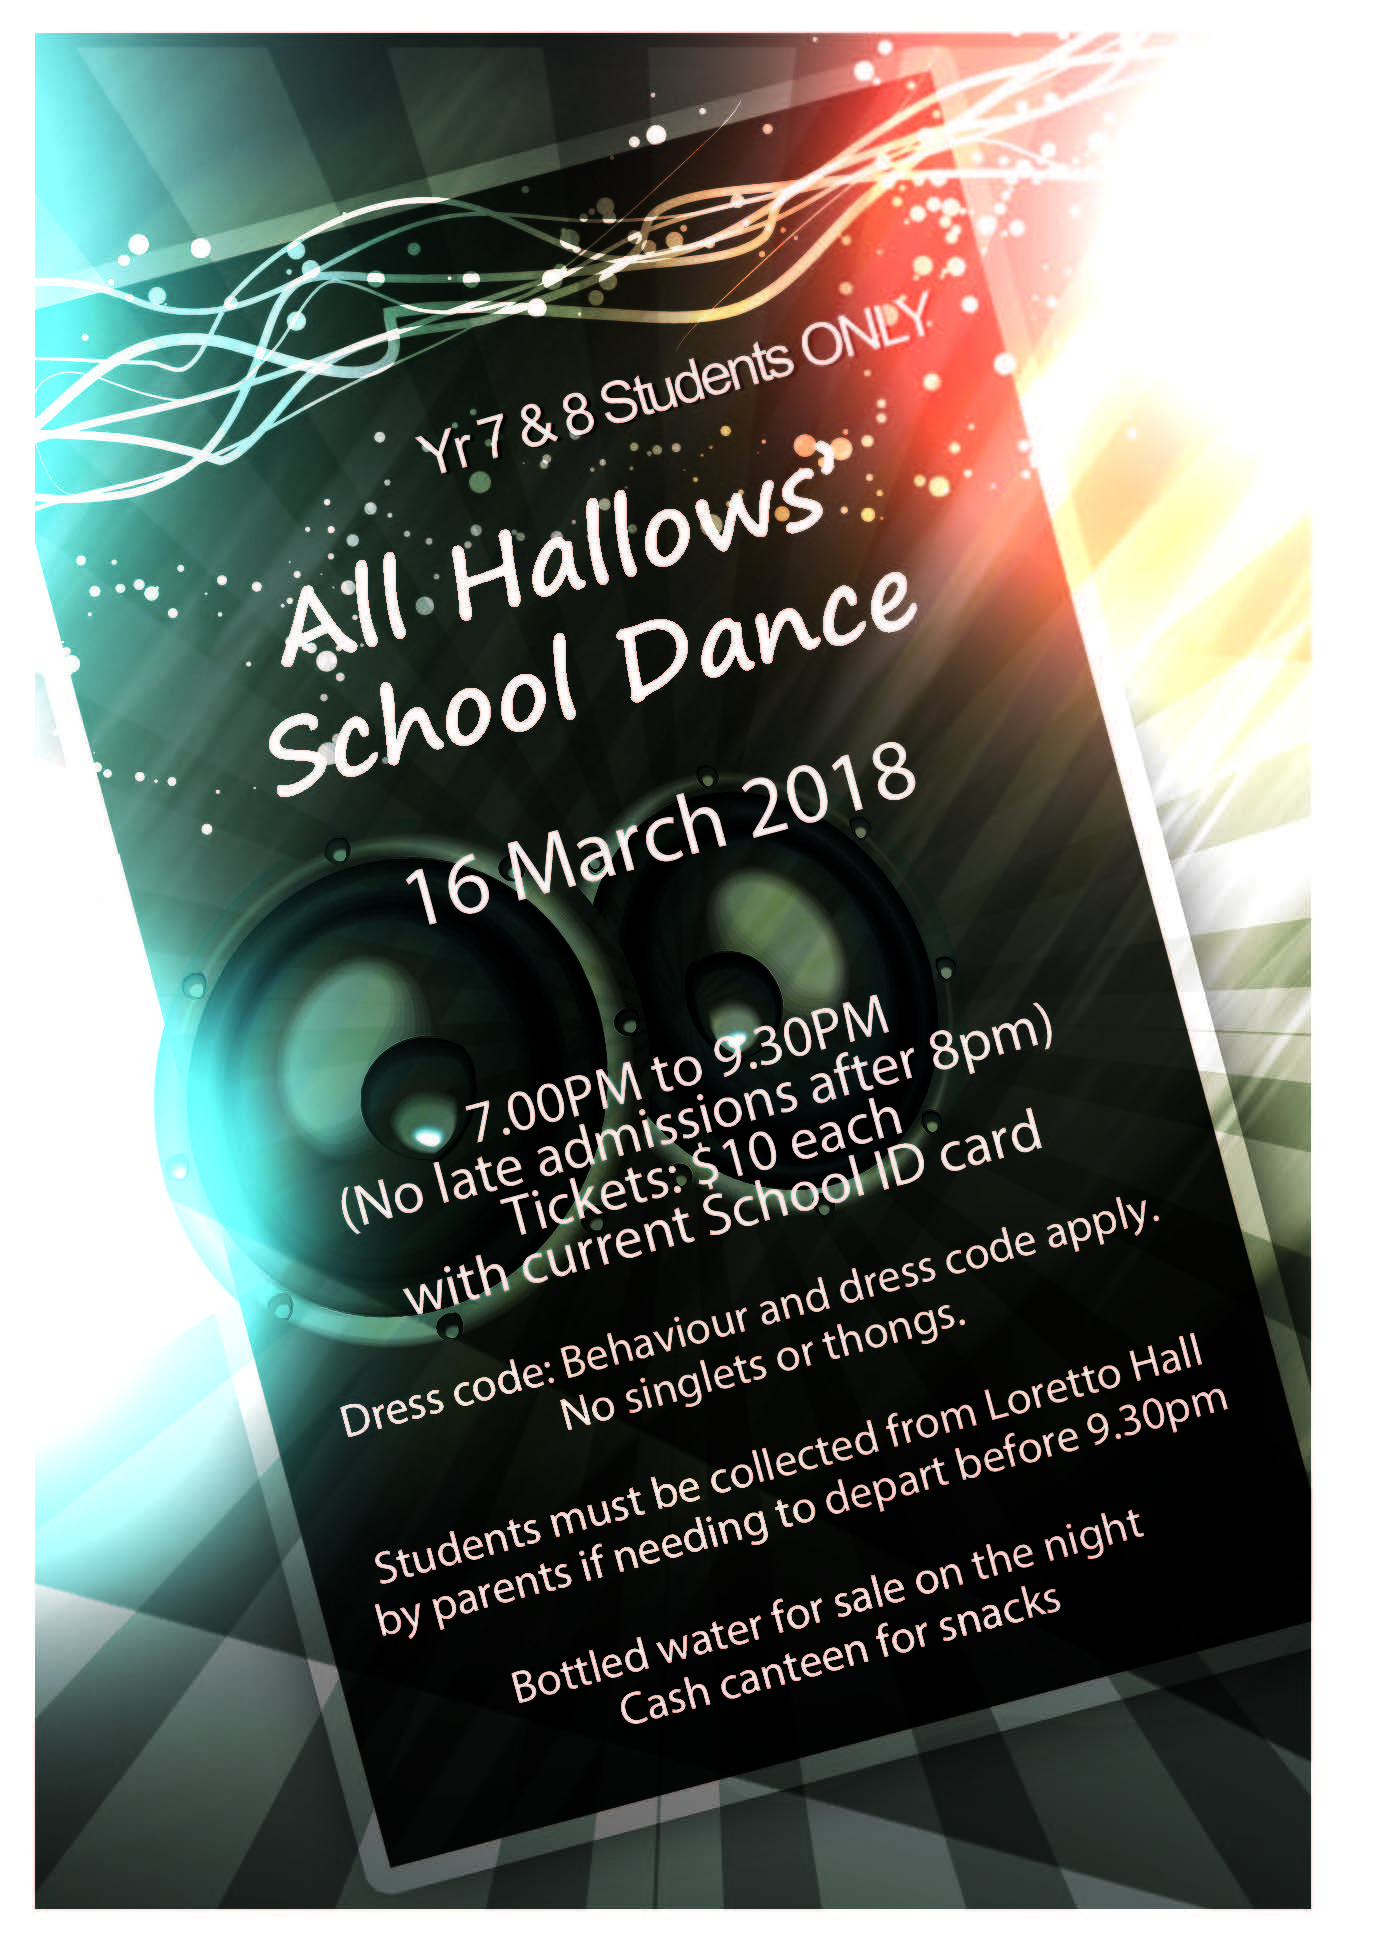 AHS-School-Dance-16March2018.jpg?mtime=2